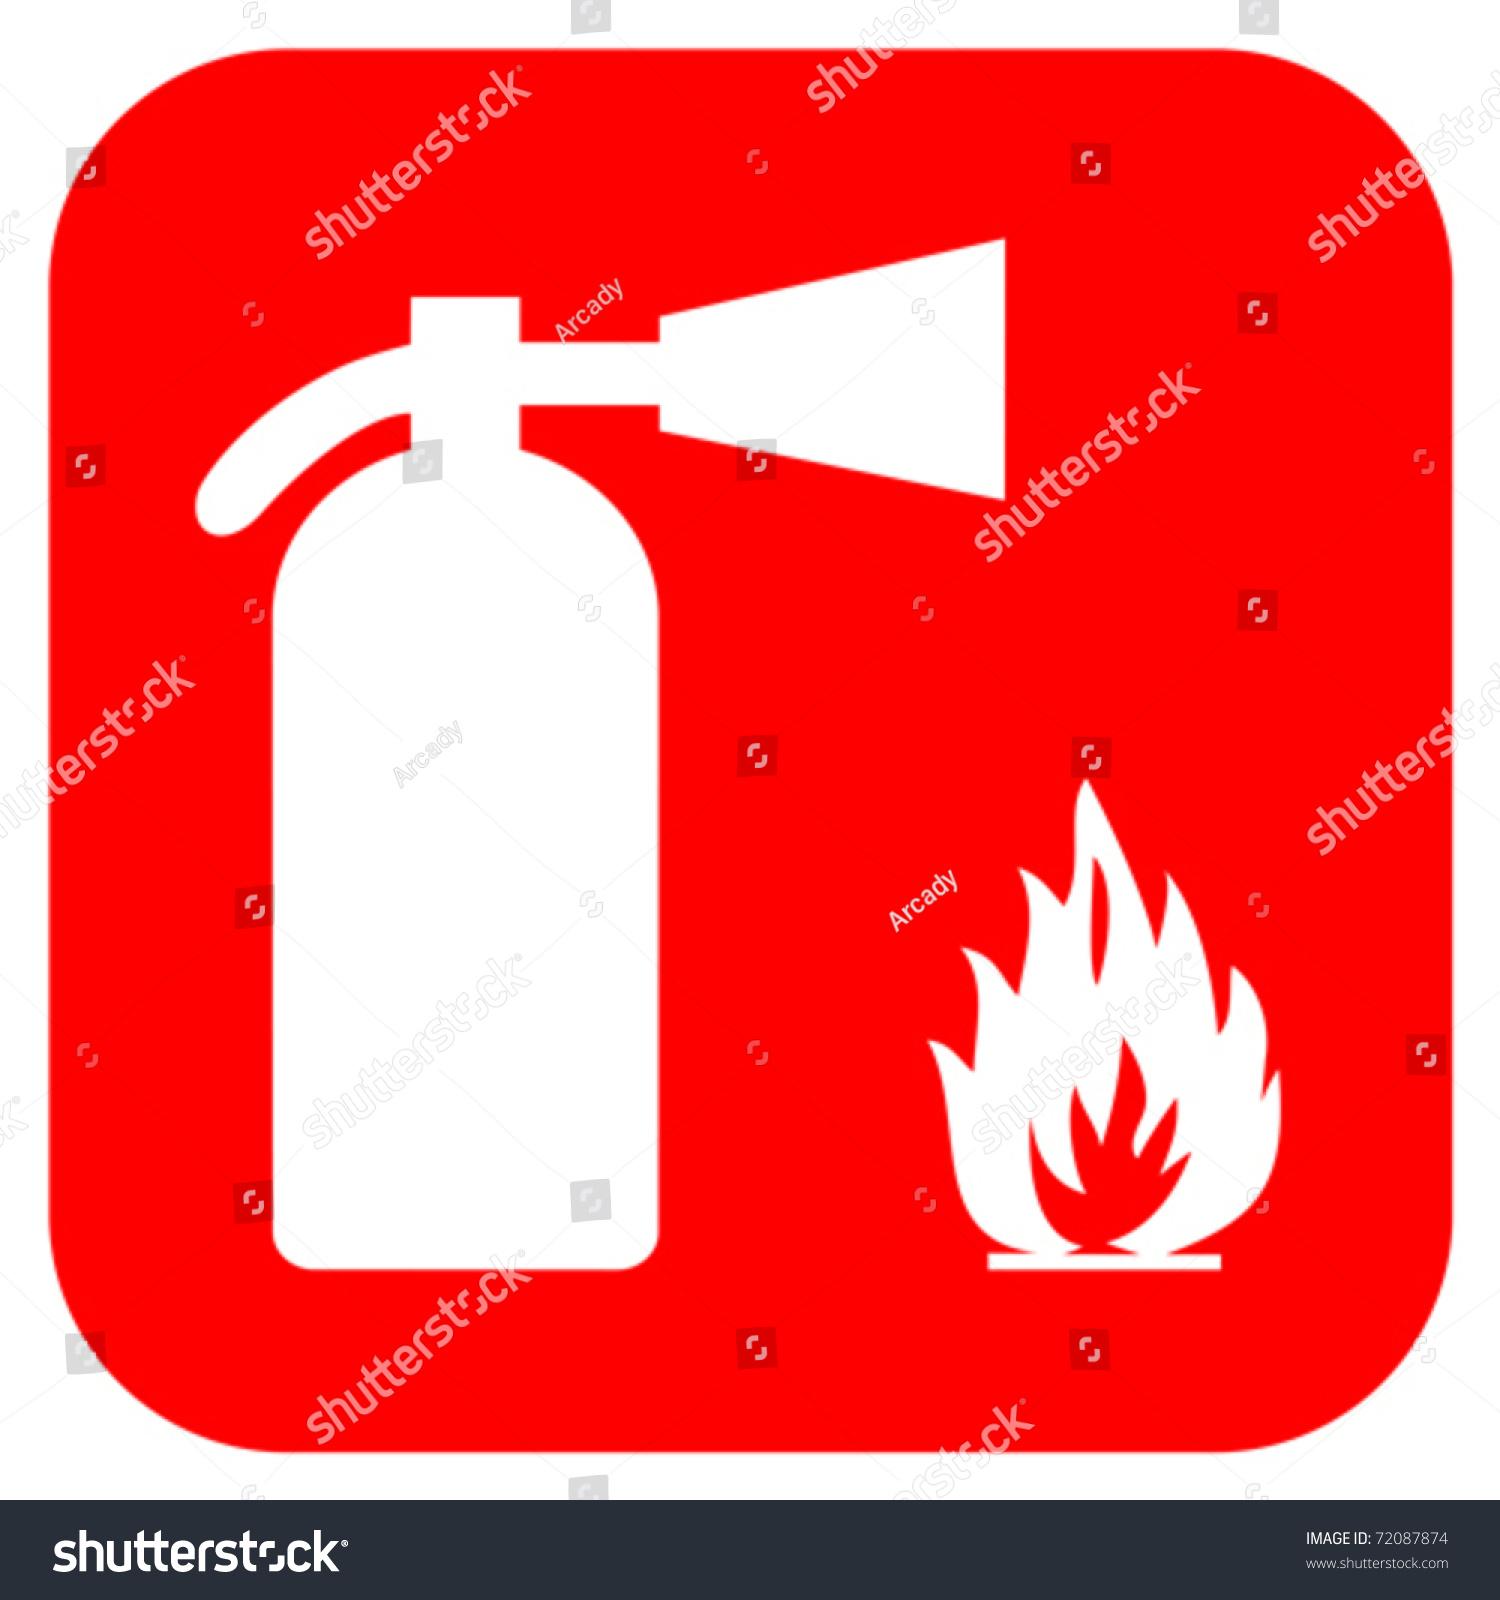 fire extinguisher sign stock vector illustration 72087874